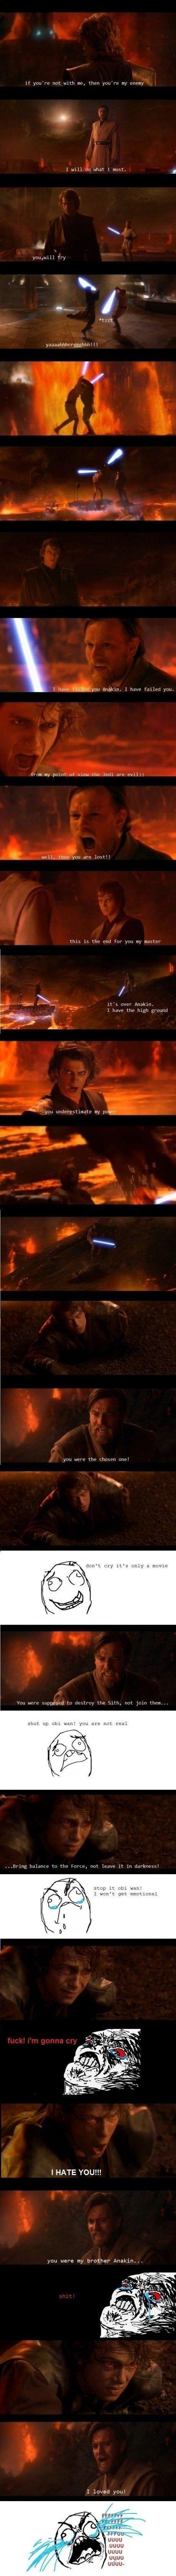 Anakin vs. Obi Wan Literally. Every time.